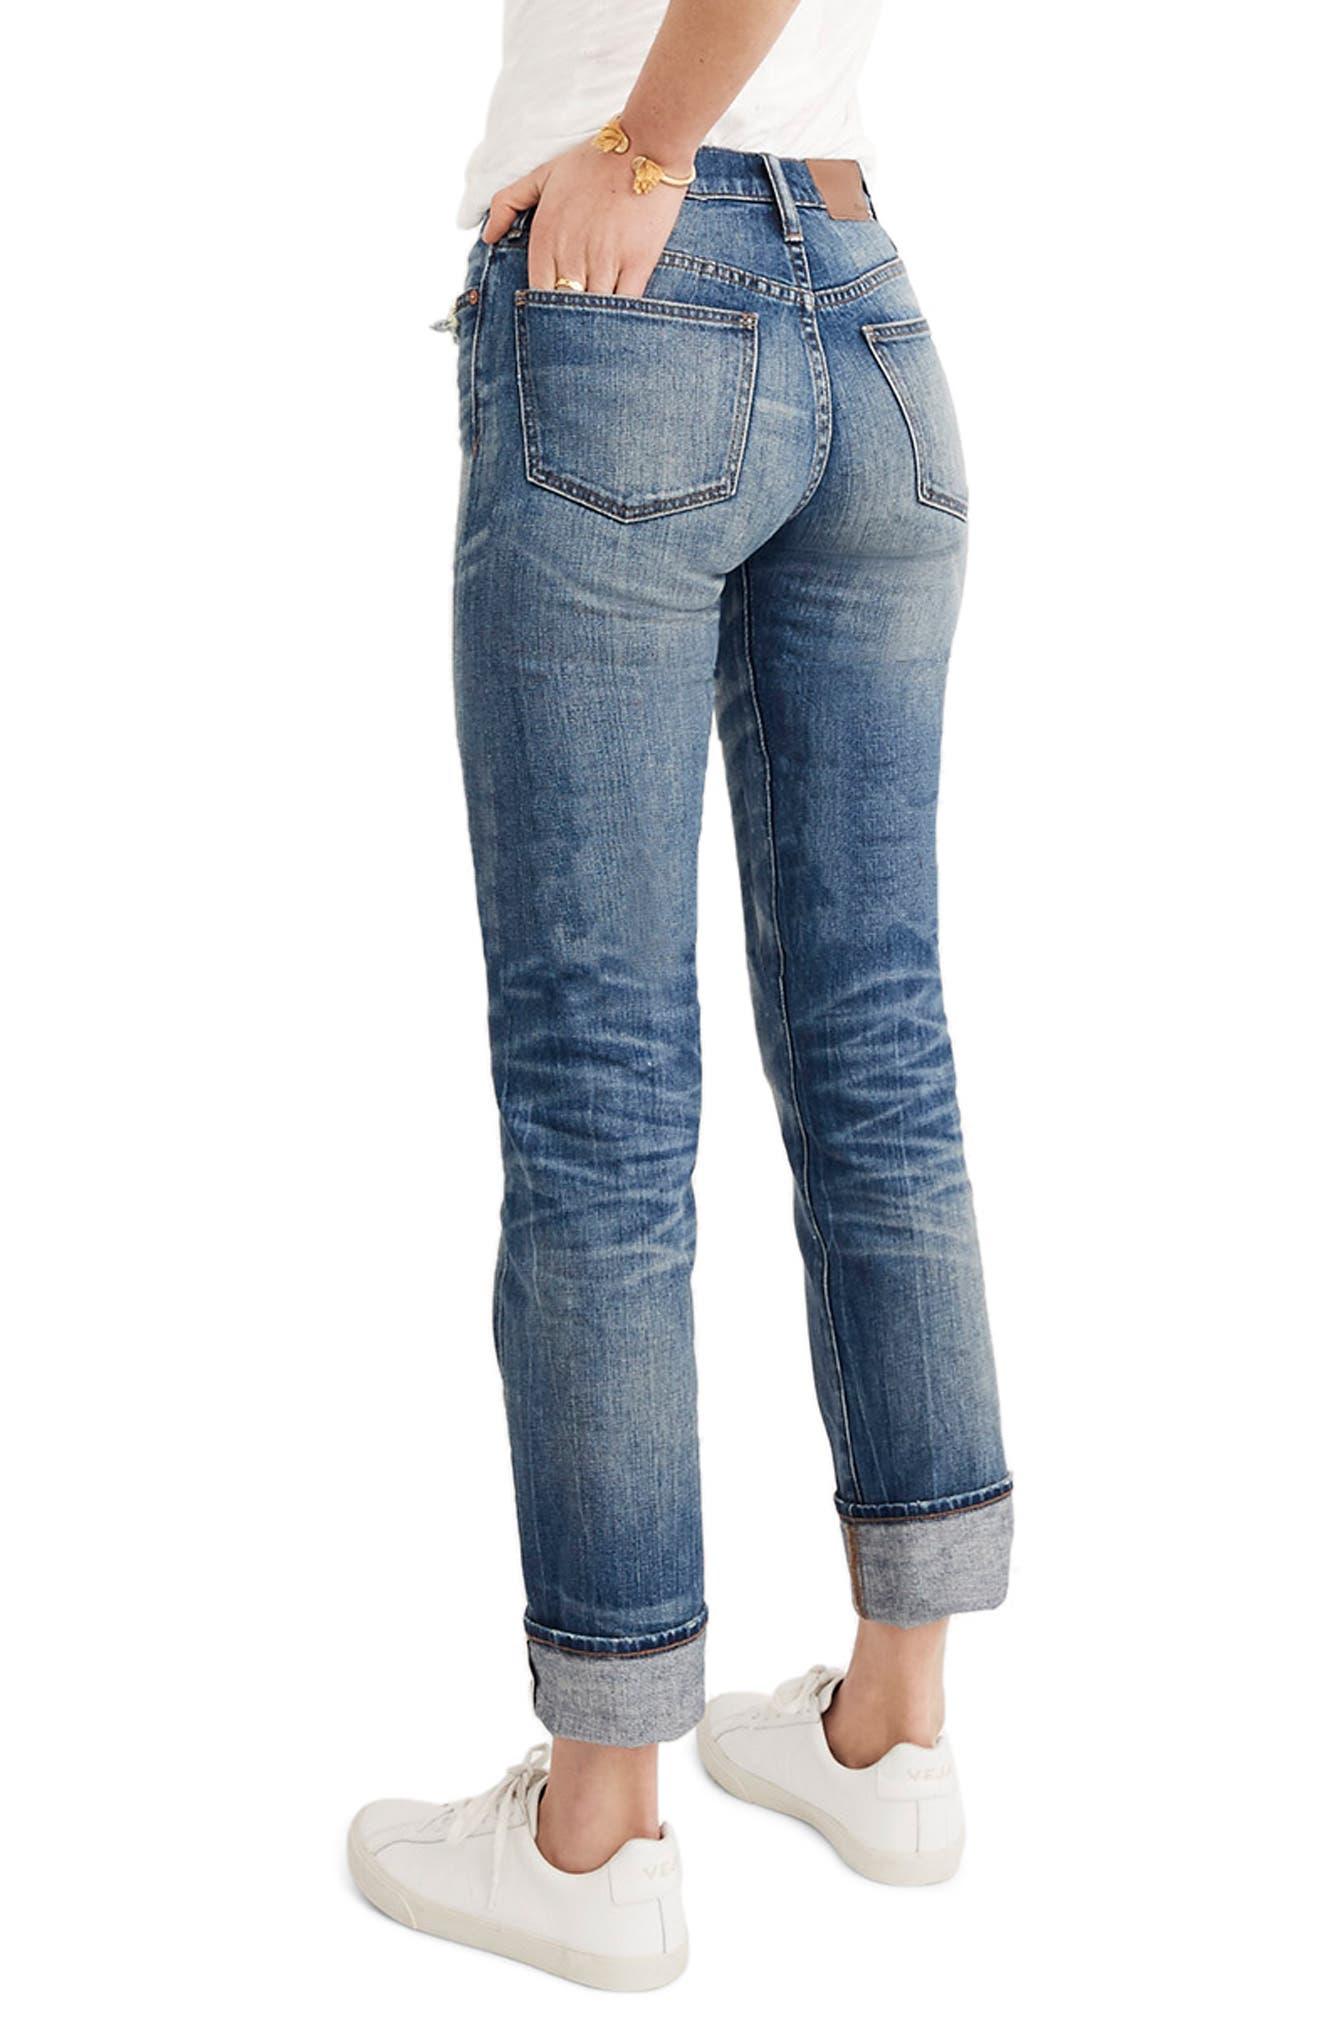 MADEWELL, Selvedge Distressed Straight Leg Jeans, Alternate thumbnail 2, color, CLOVERDALE